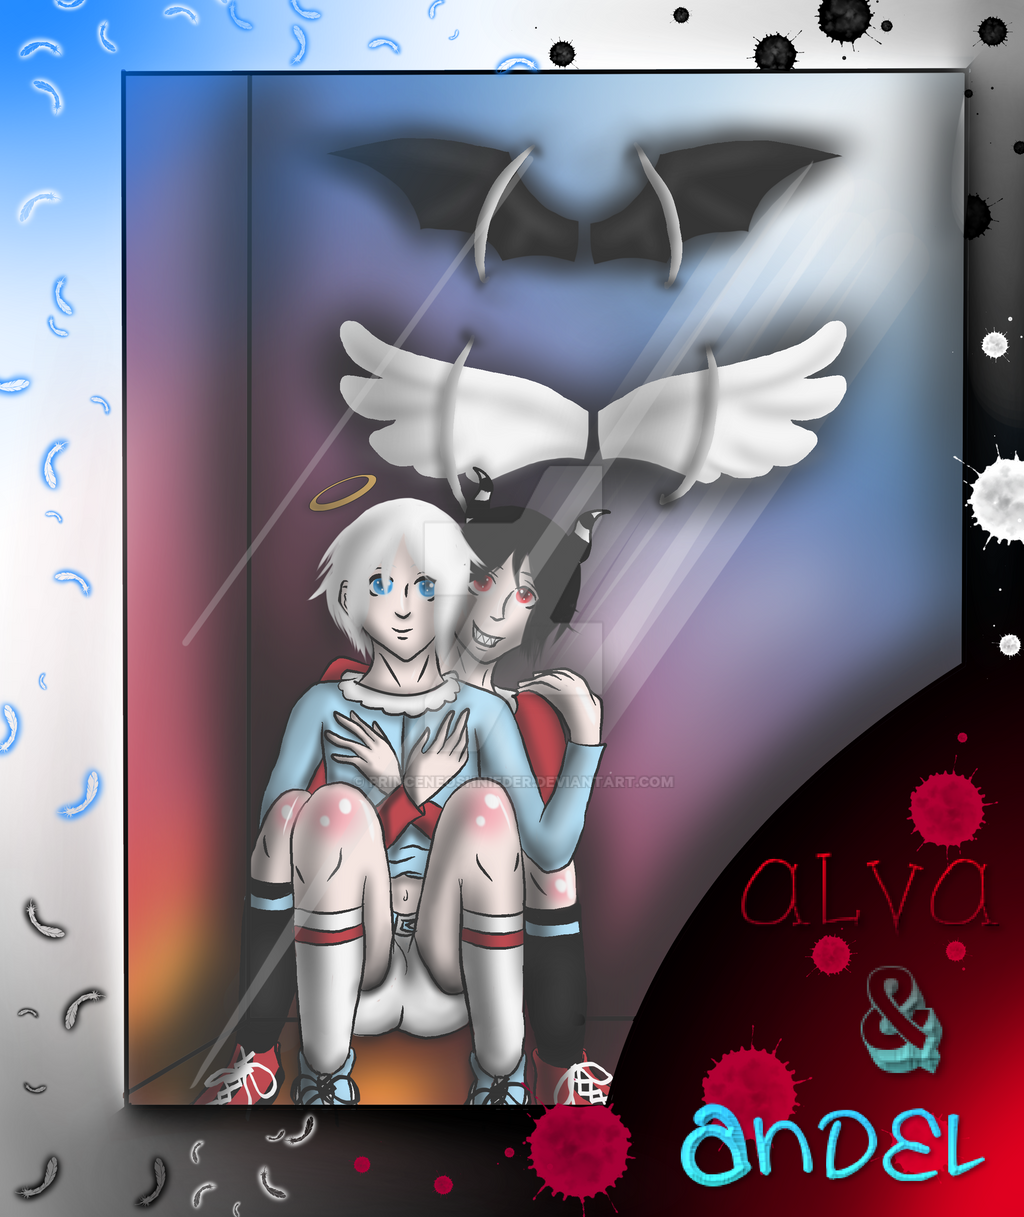 Alva and Andel Dolls by PrinceNeoShnieder